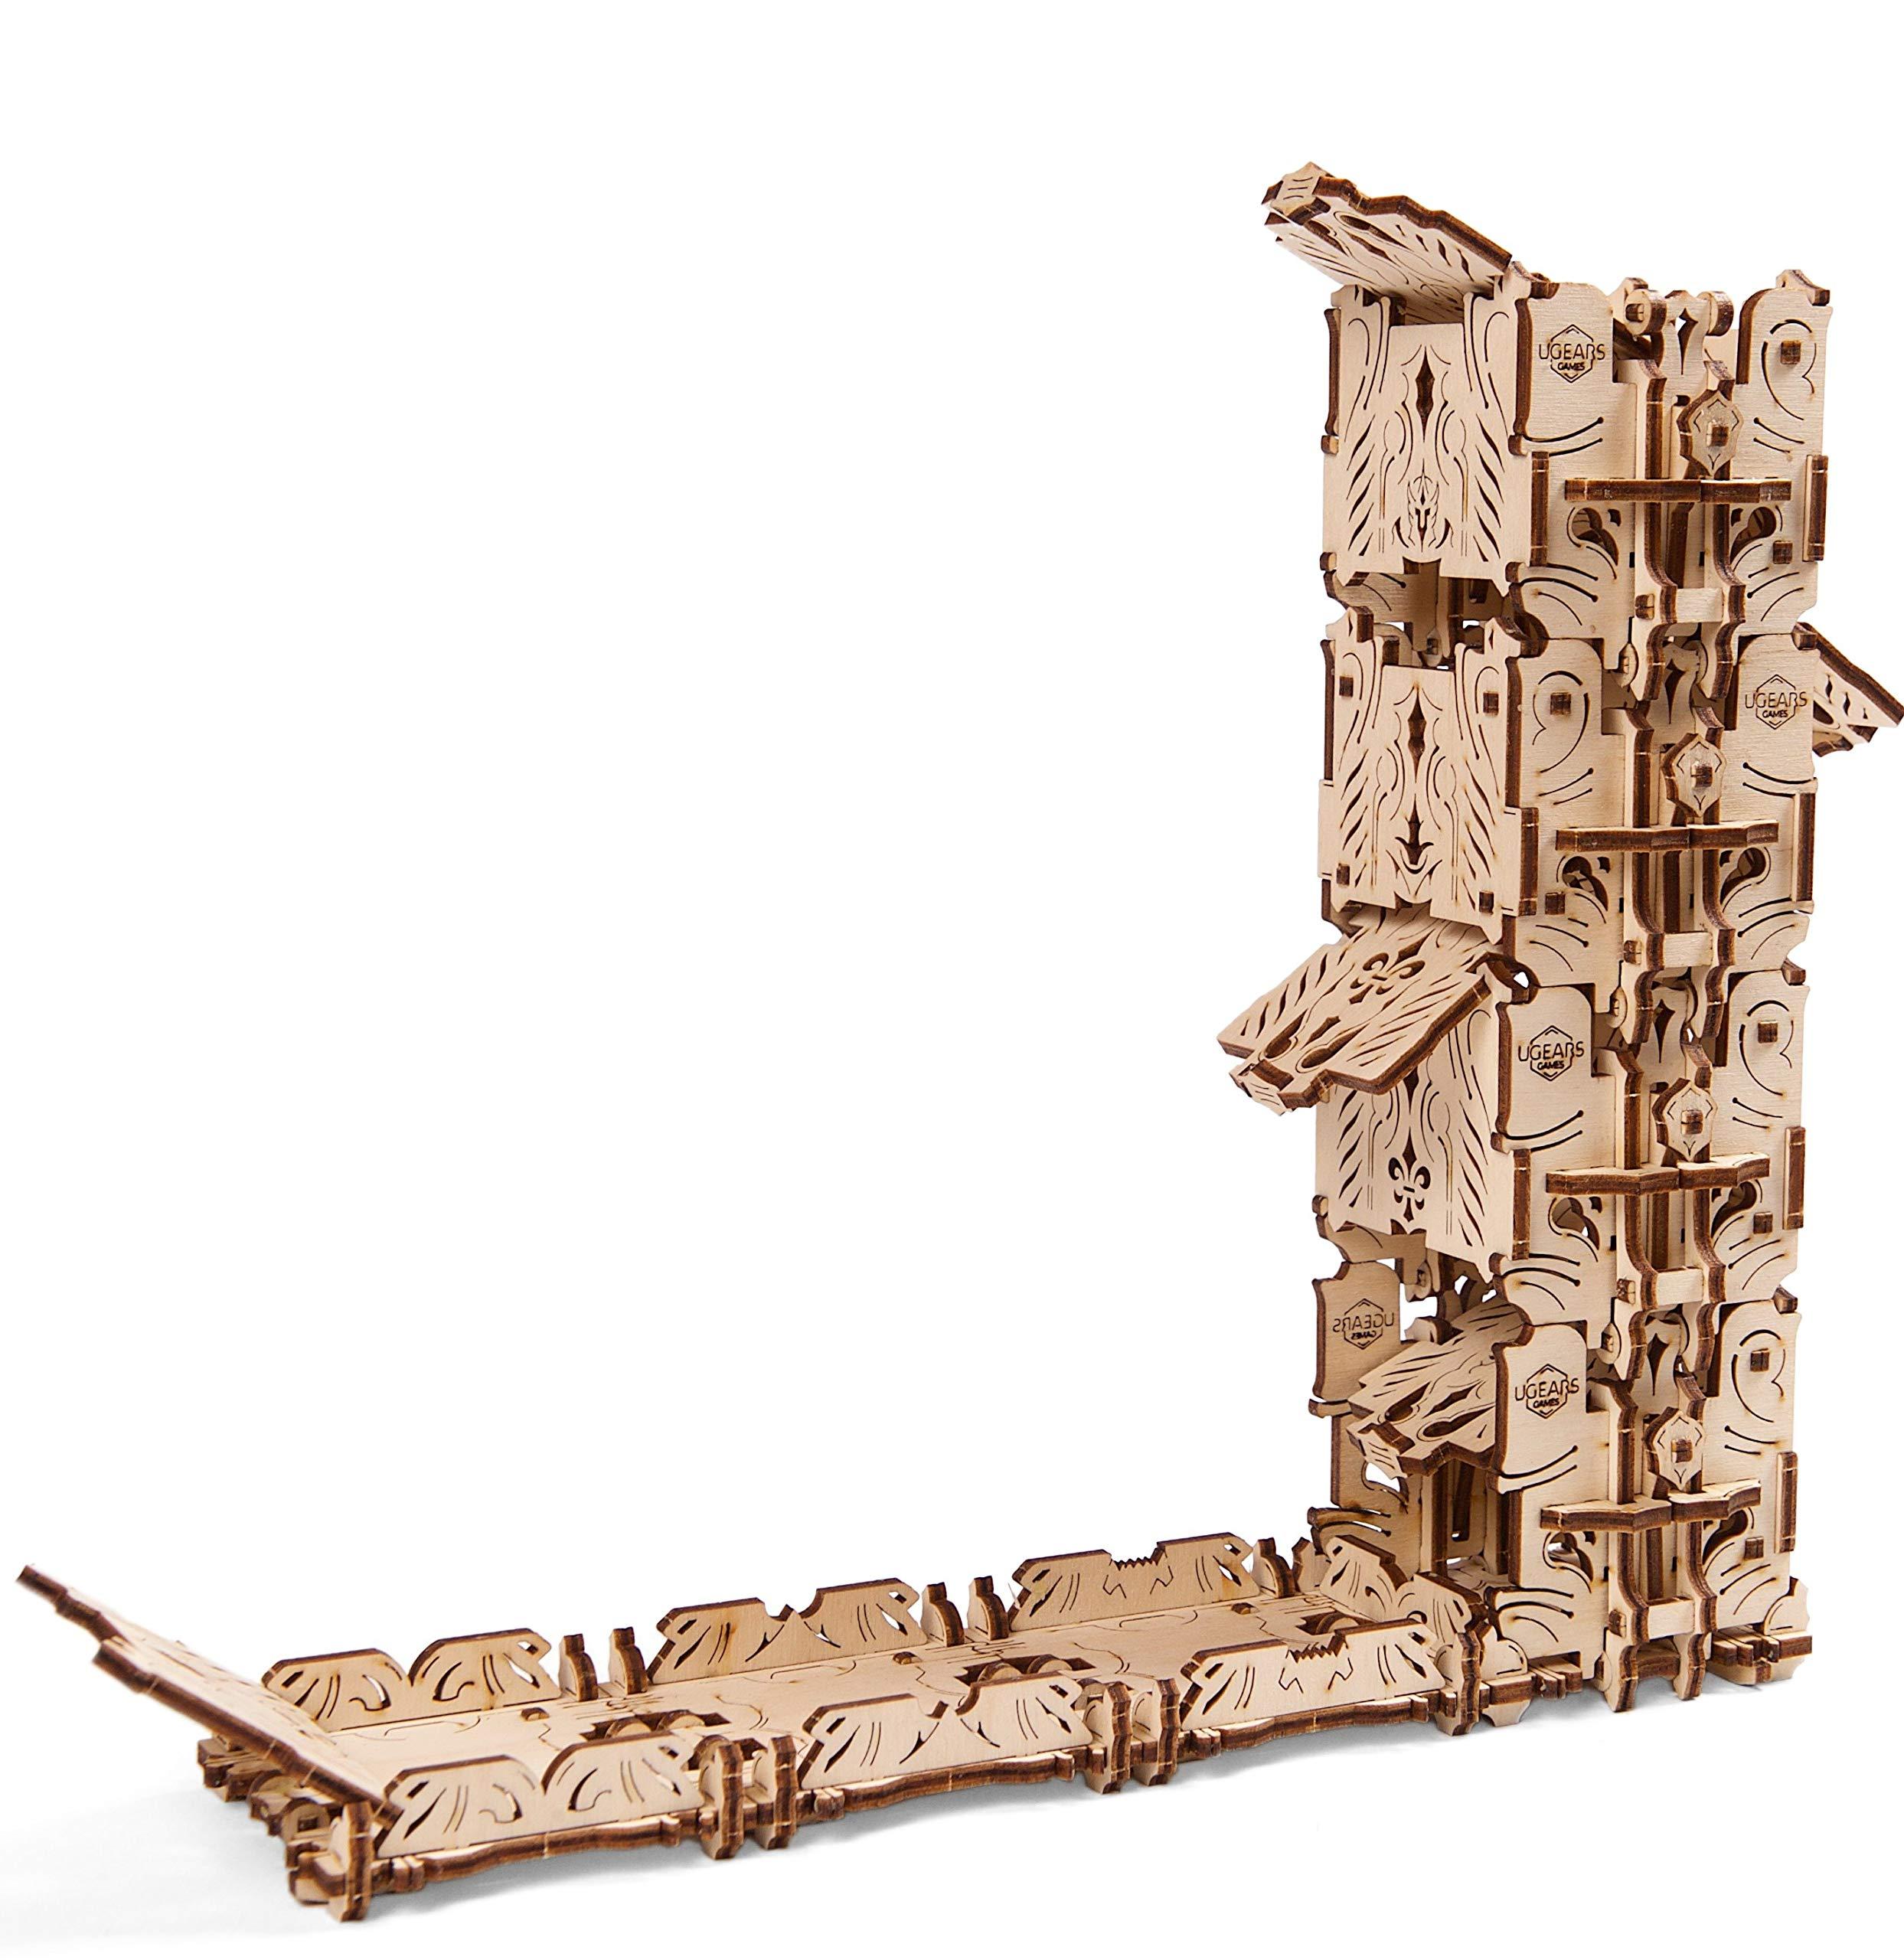 Ugears Modular Dice Tower, Wood Laser